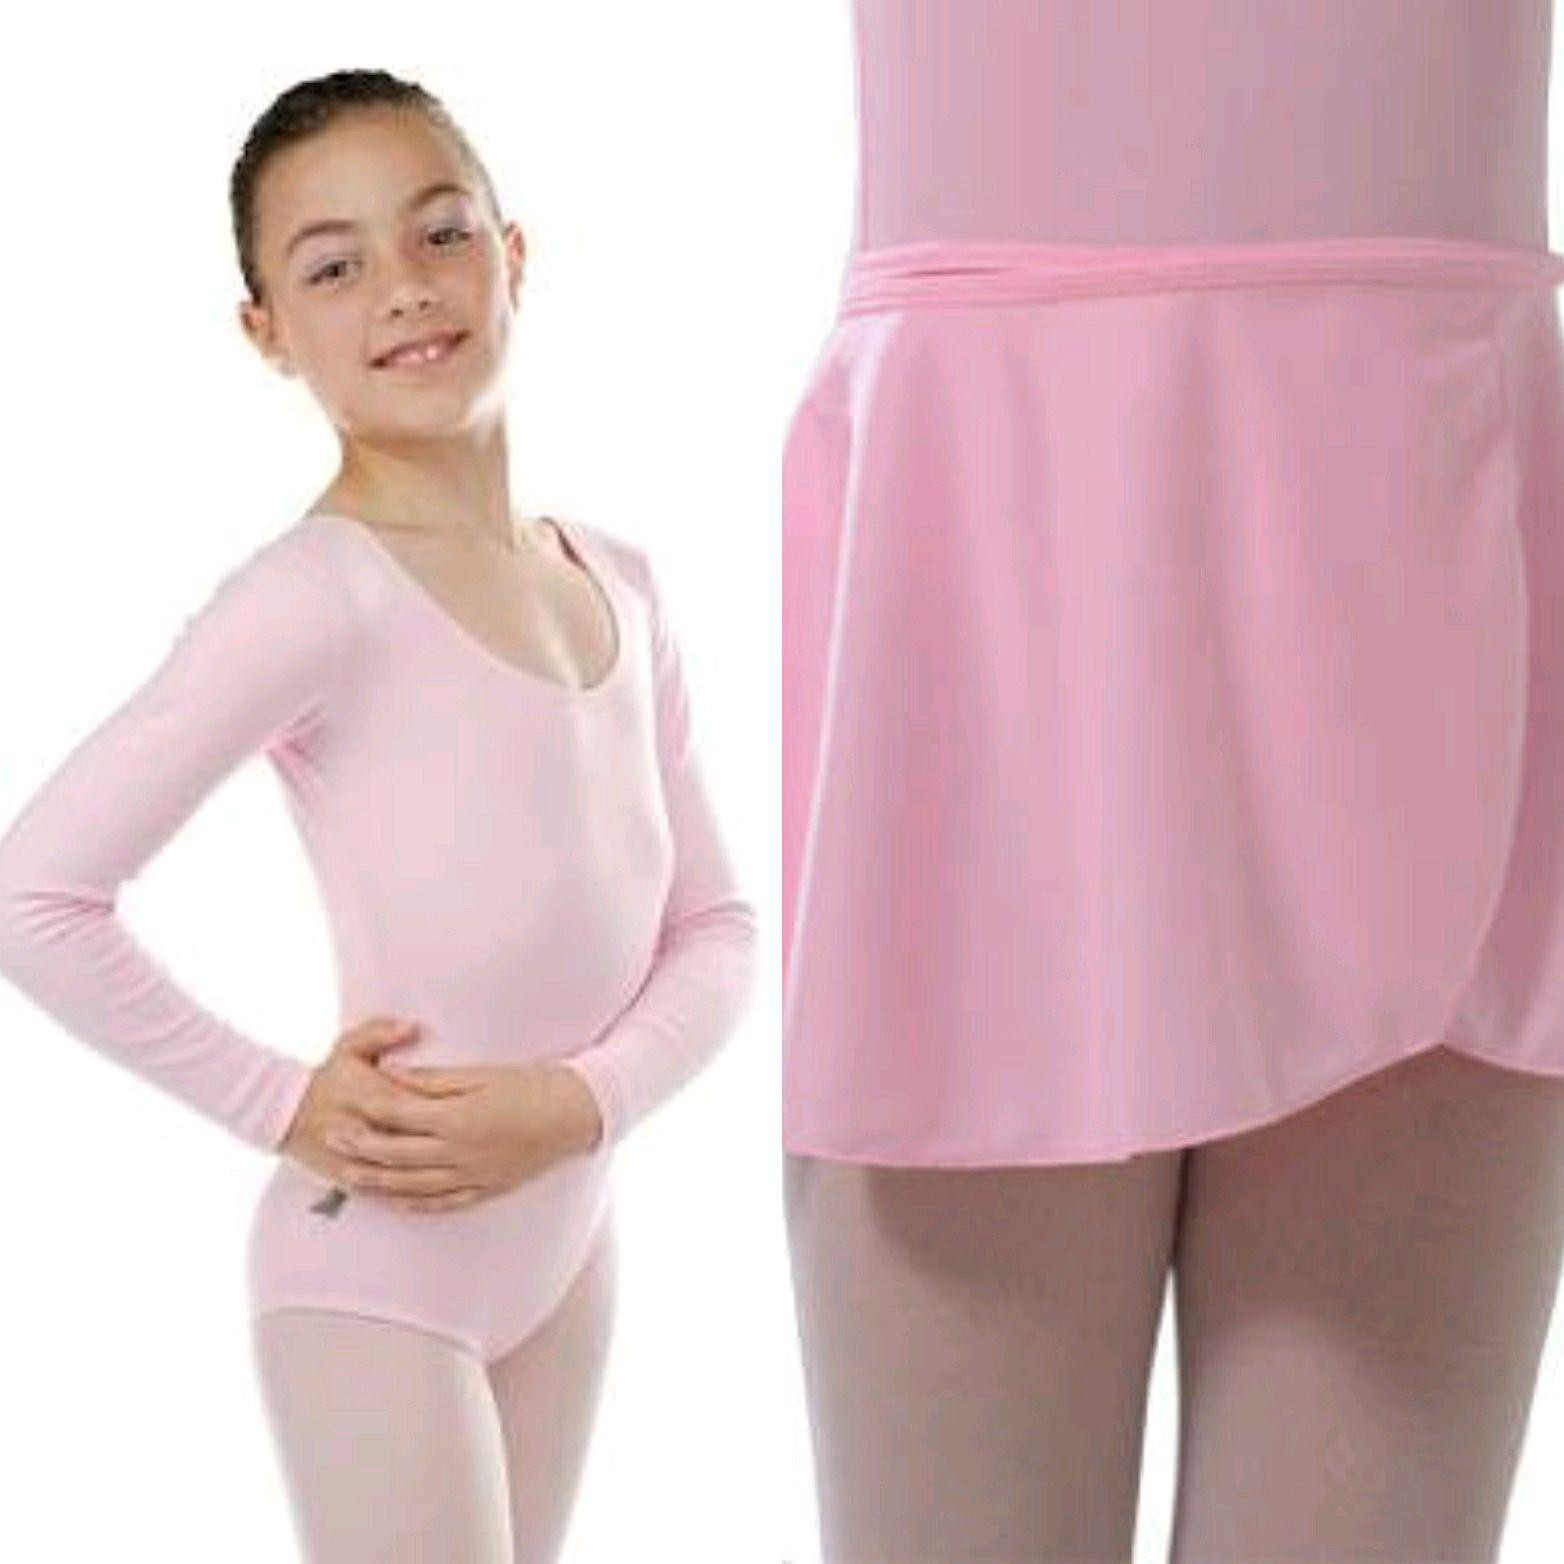 be81d72905080 Kit de Ballet | Elo7